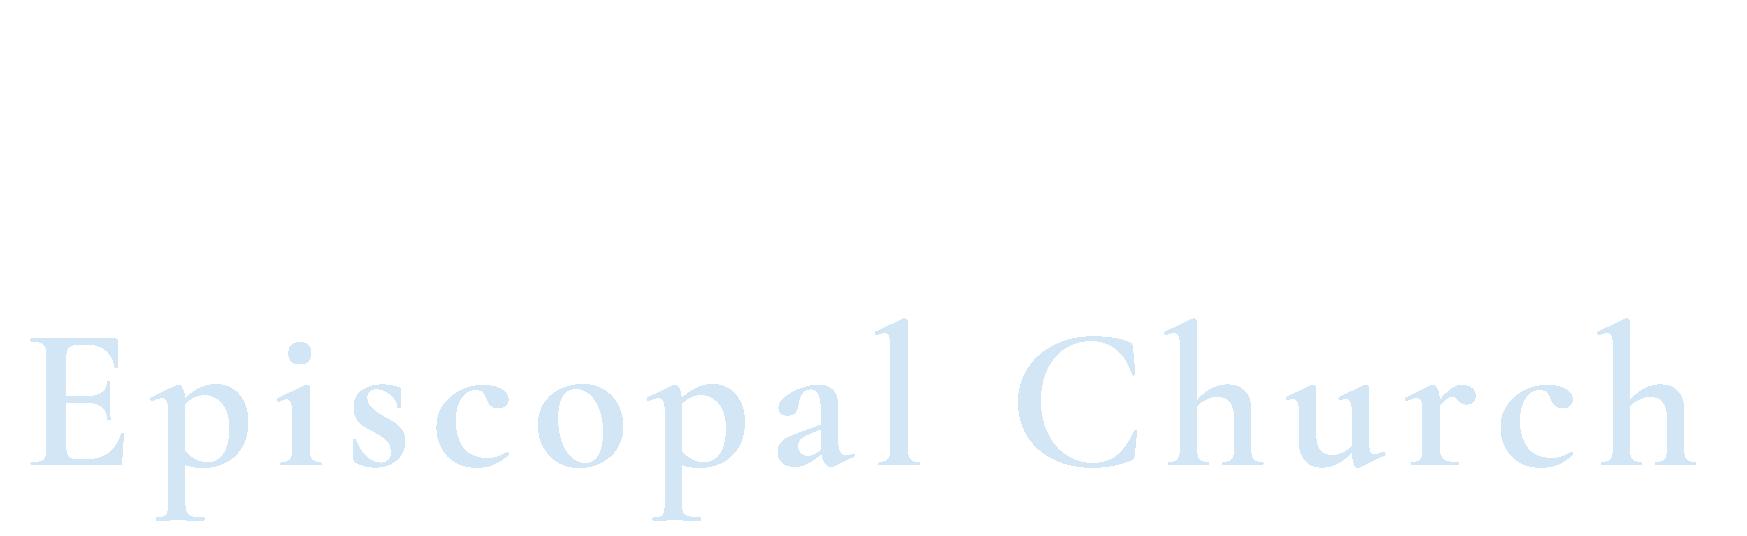 St-Michael's-Logo-032819-06.png